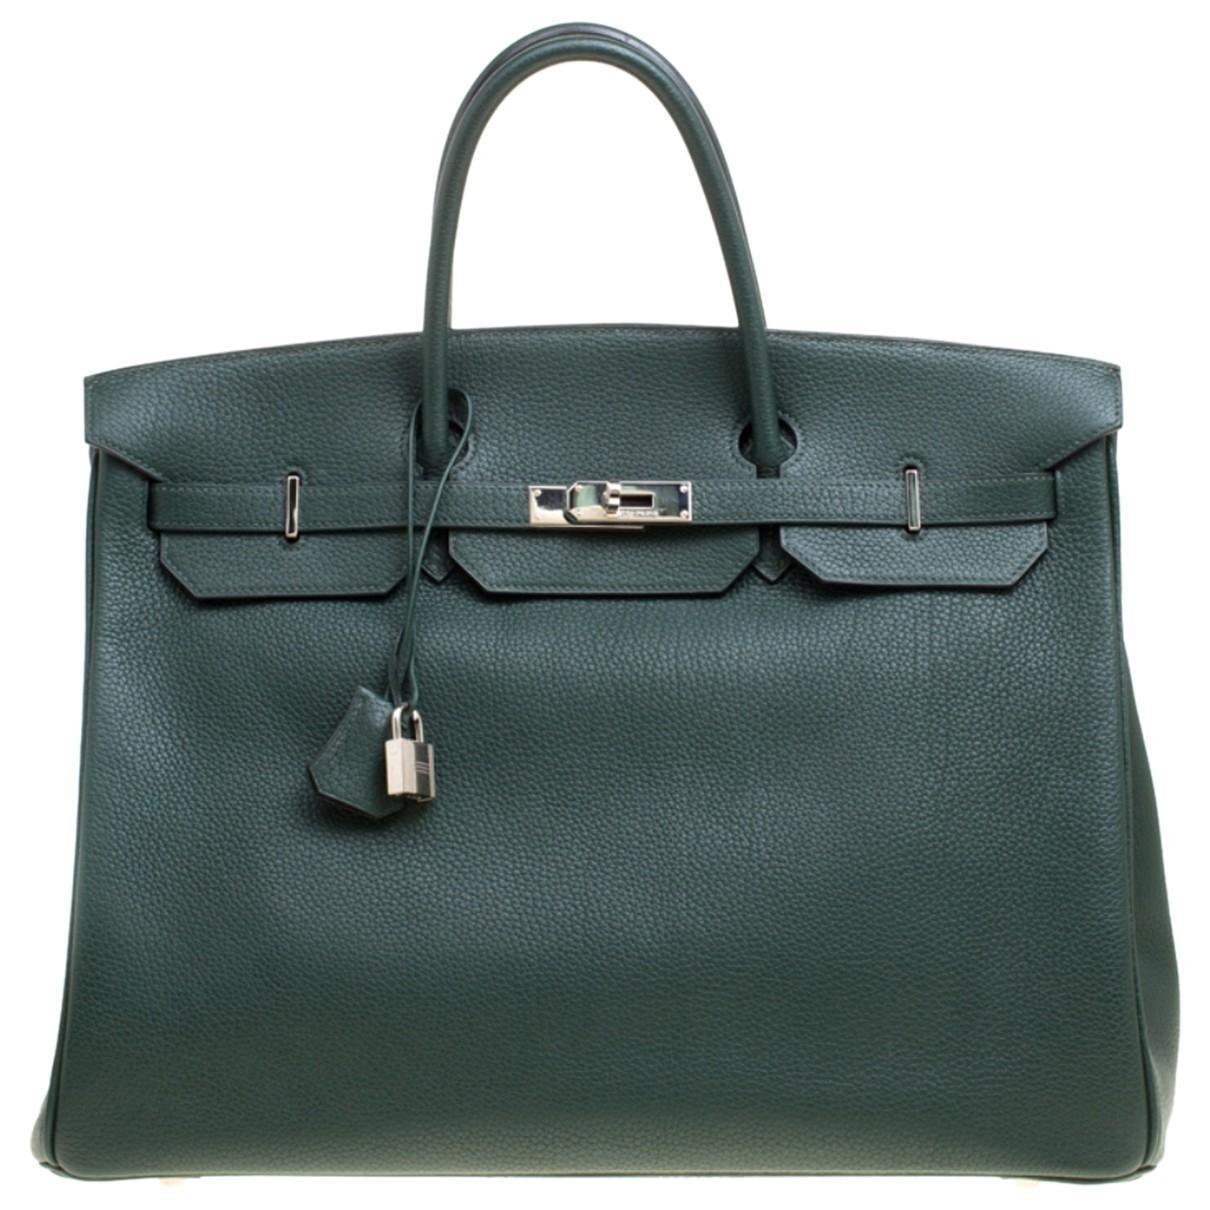 b12d694686 Lyst - Hermès Birkin 40 Green Leather Handbag in Green